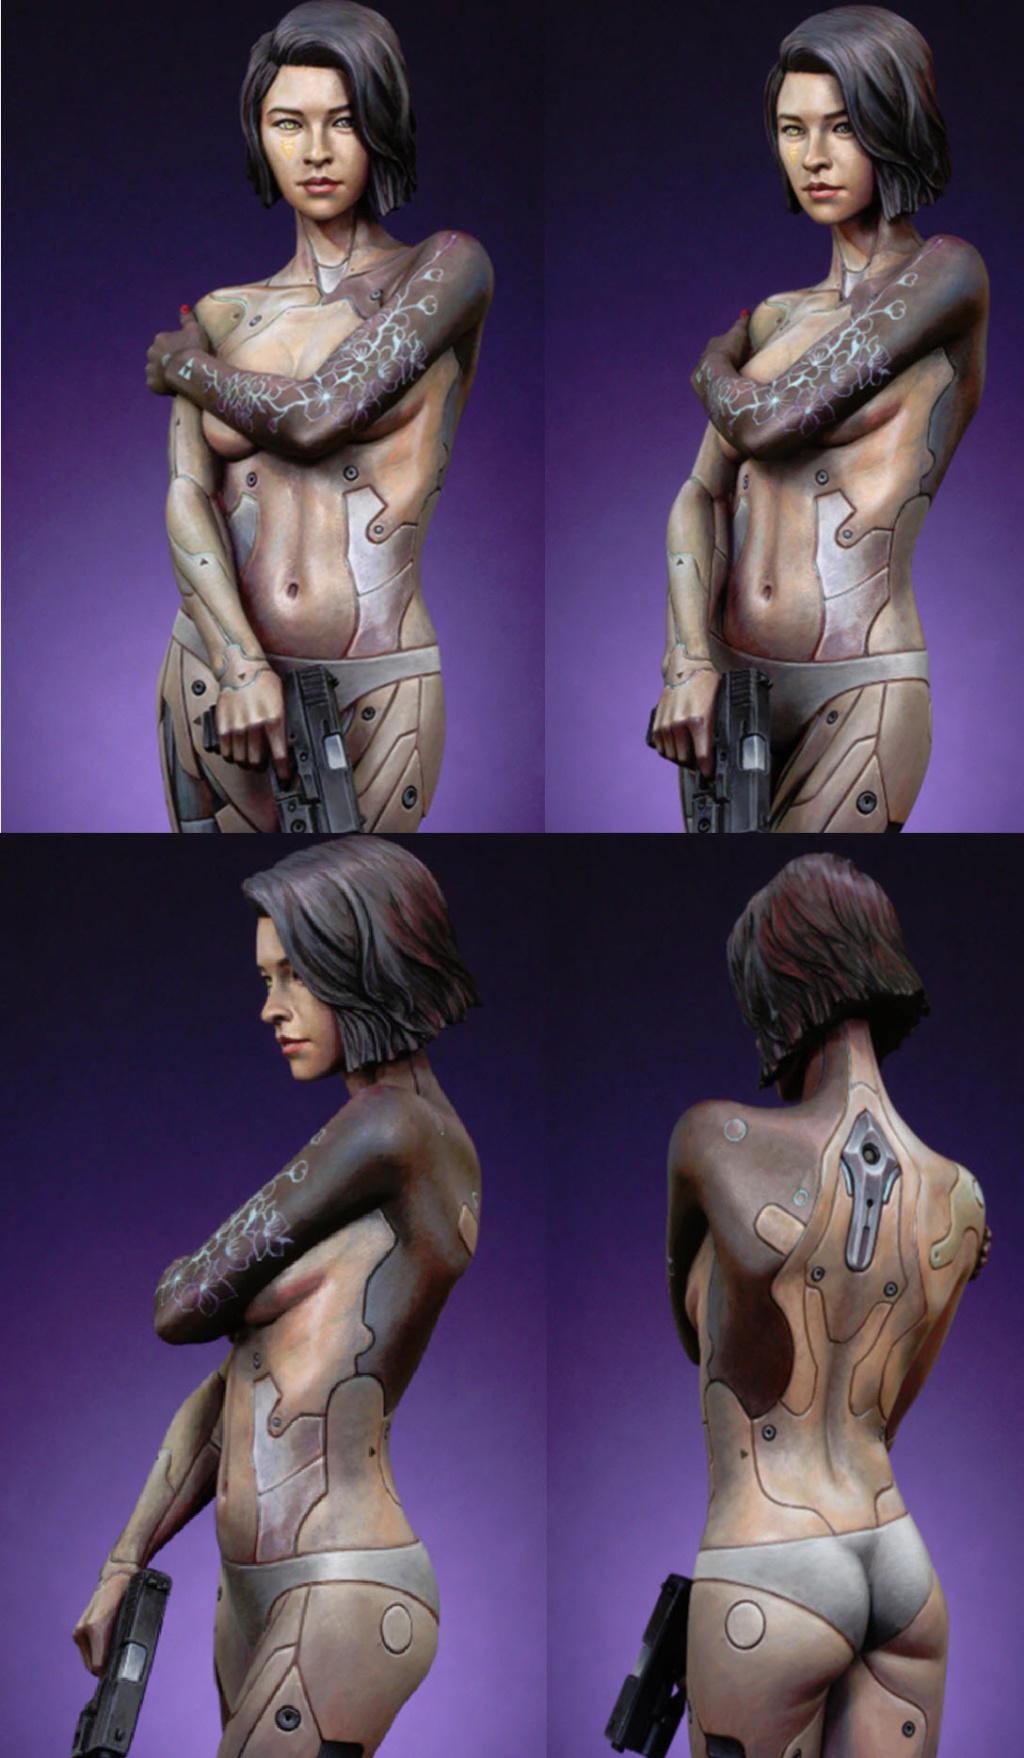 Mirai buste cyborg assassin Life miniature 1/12 M410